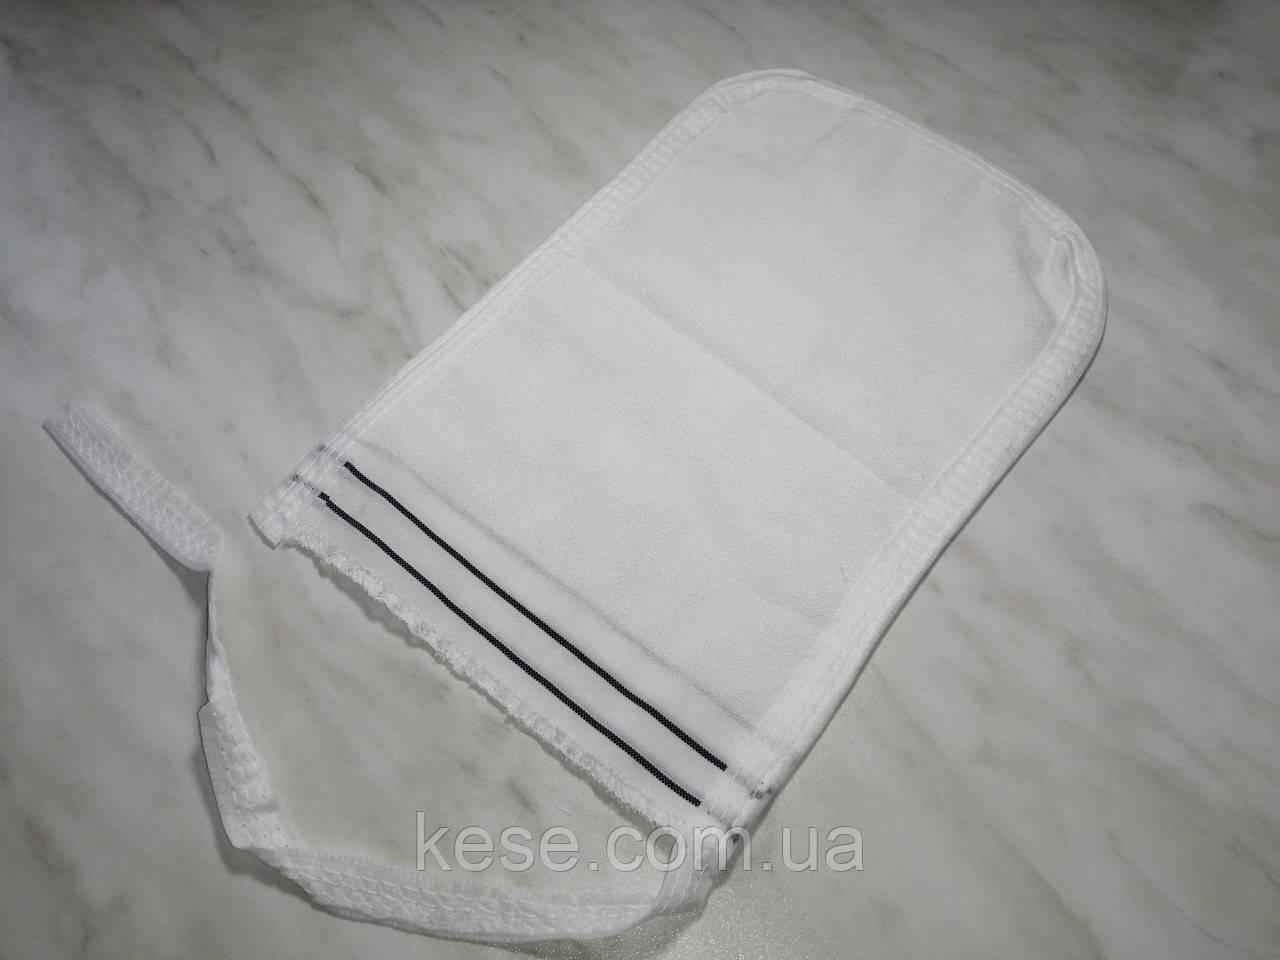 Массажная перчатка кесе для тела  (мягкой текстуры).